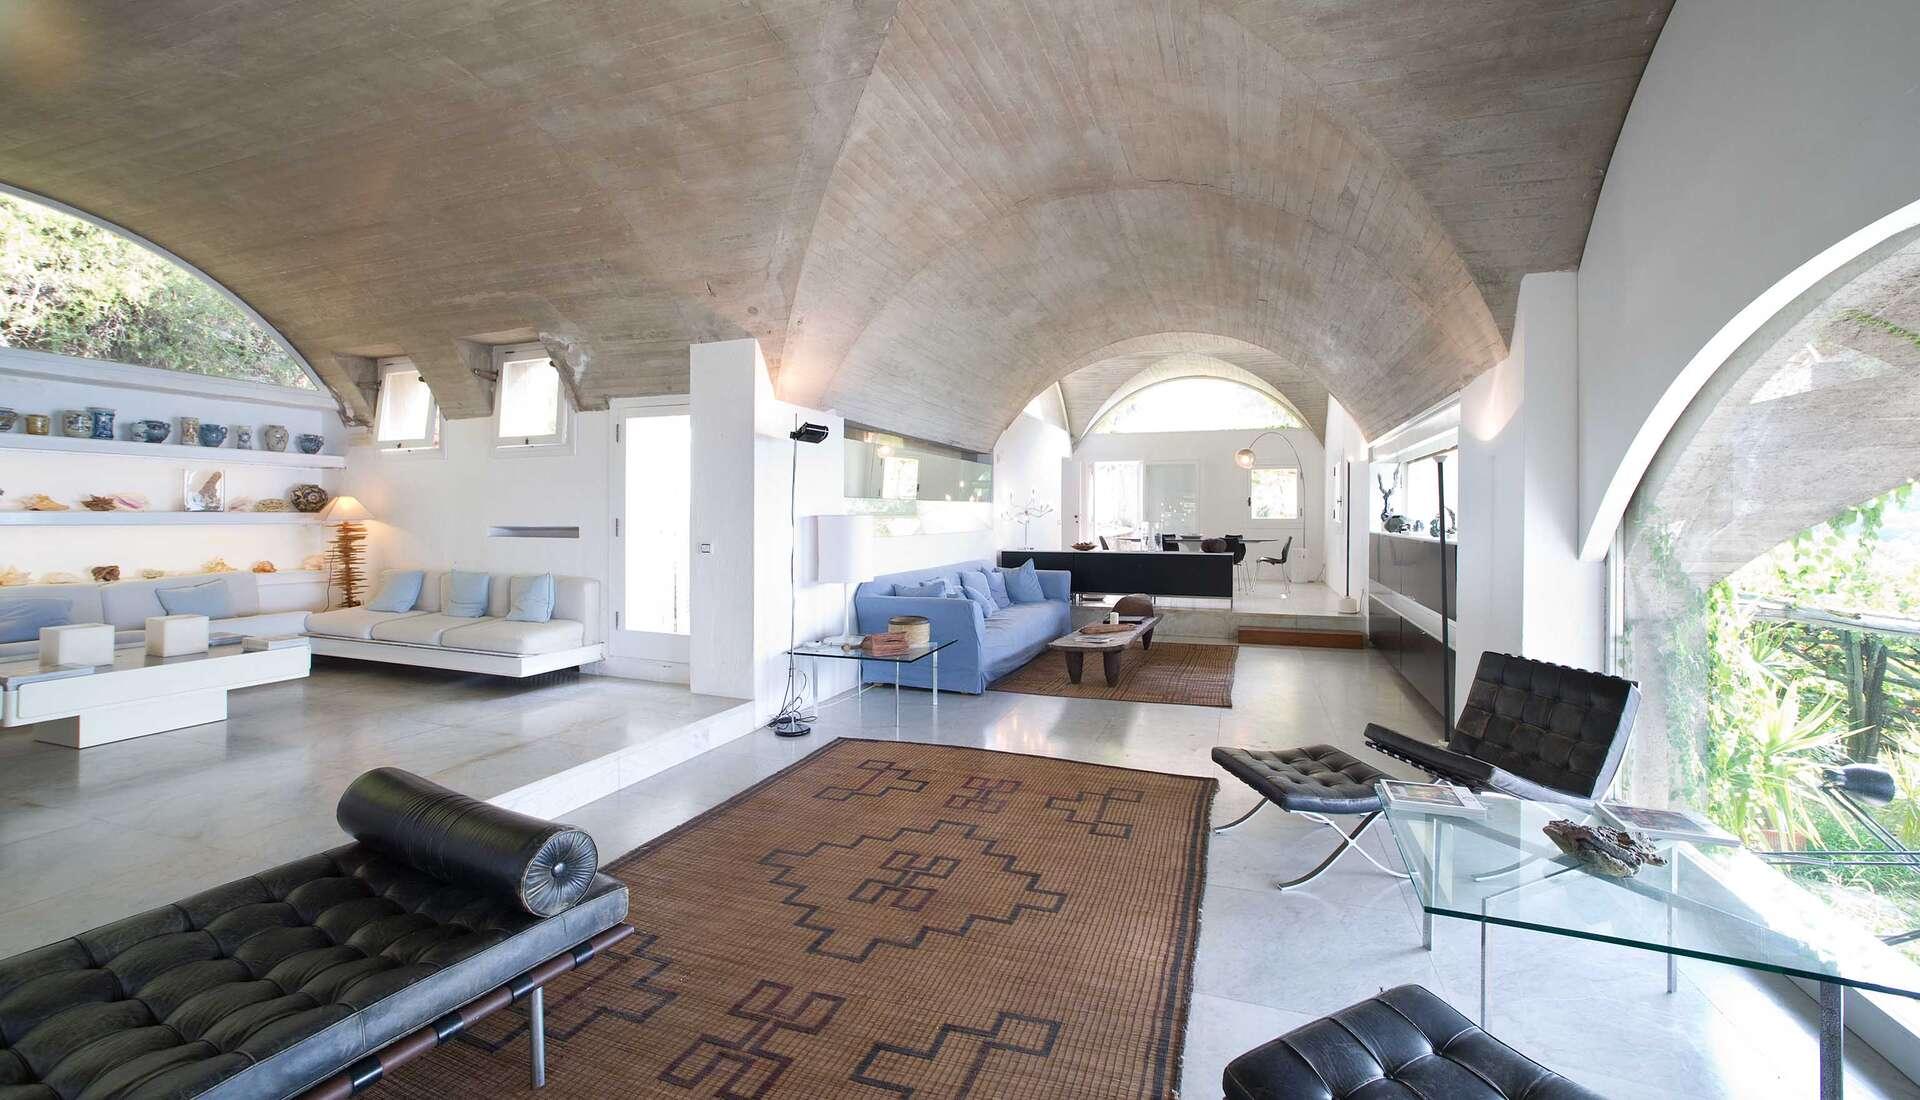 Luxury vacation rentals europe - Italy - Amalfi coast - Maiori - Villa Luisa - Image 1/18